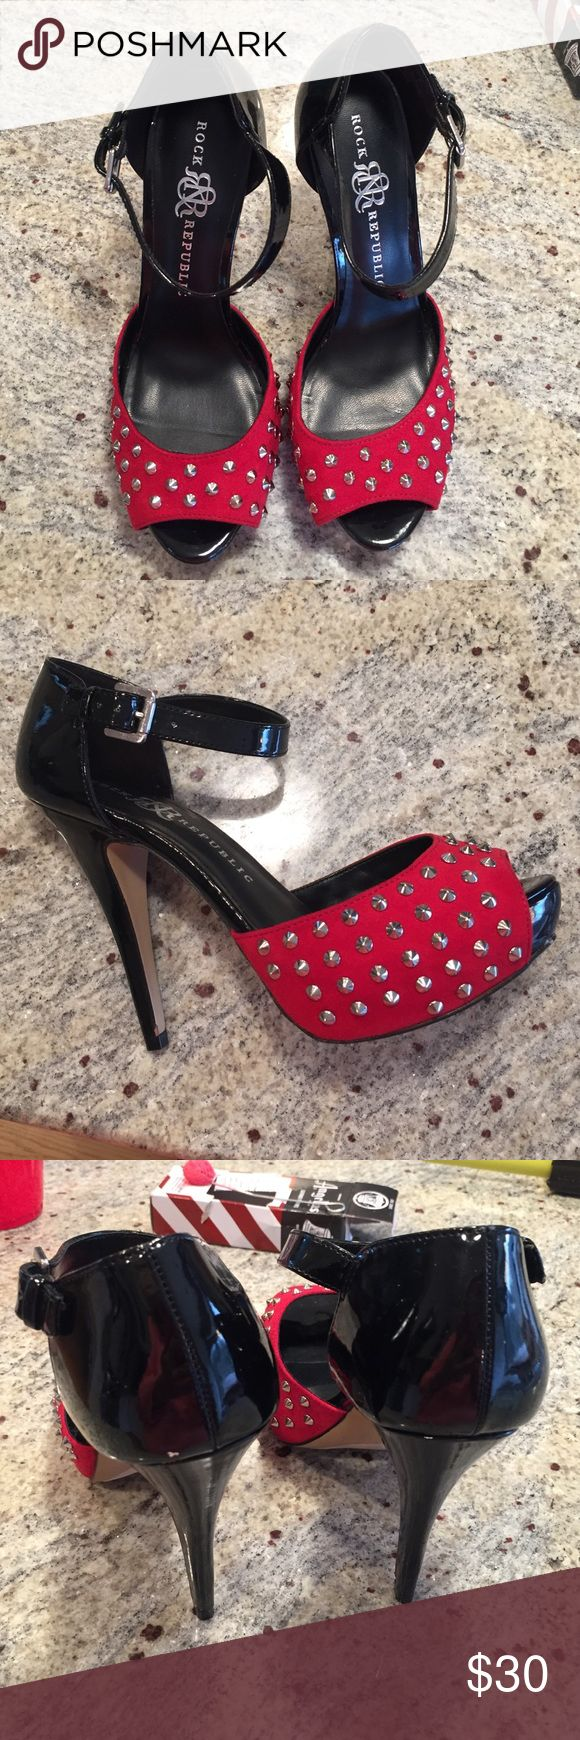 Rock & Republic Red White and Black Stilettos Brand new R&R Stilettos. Rock & Republic Shoes Heels